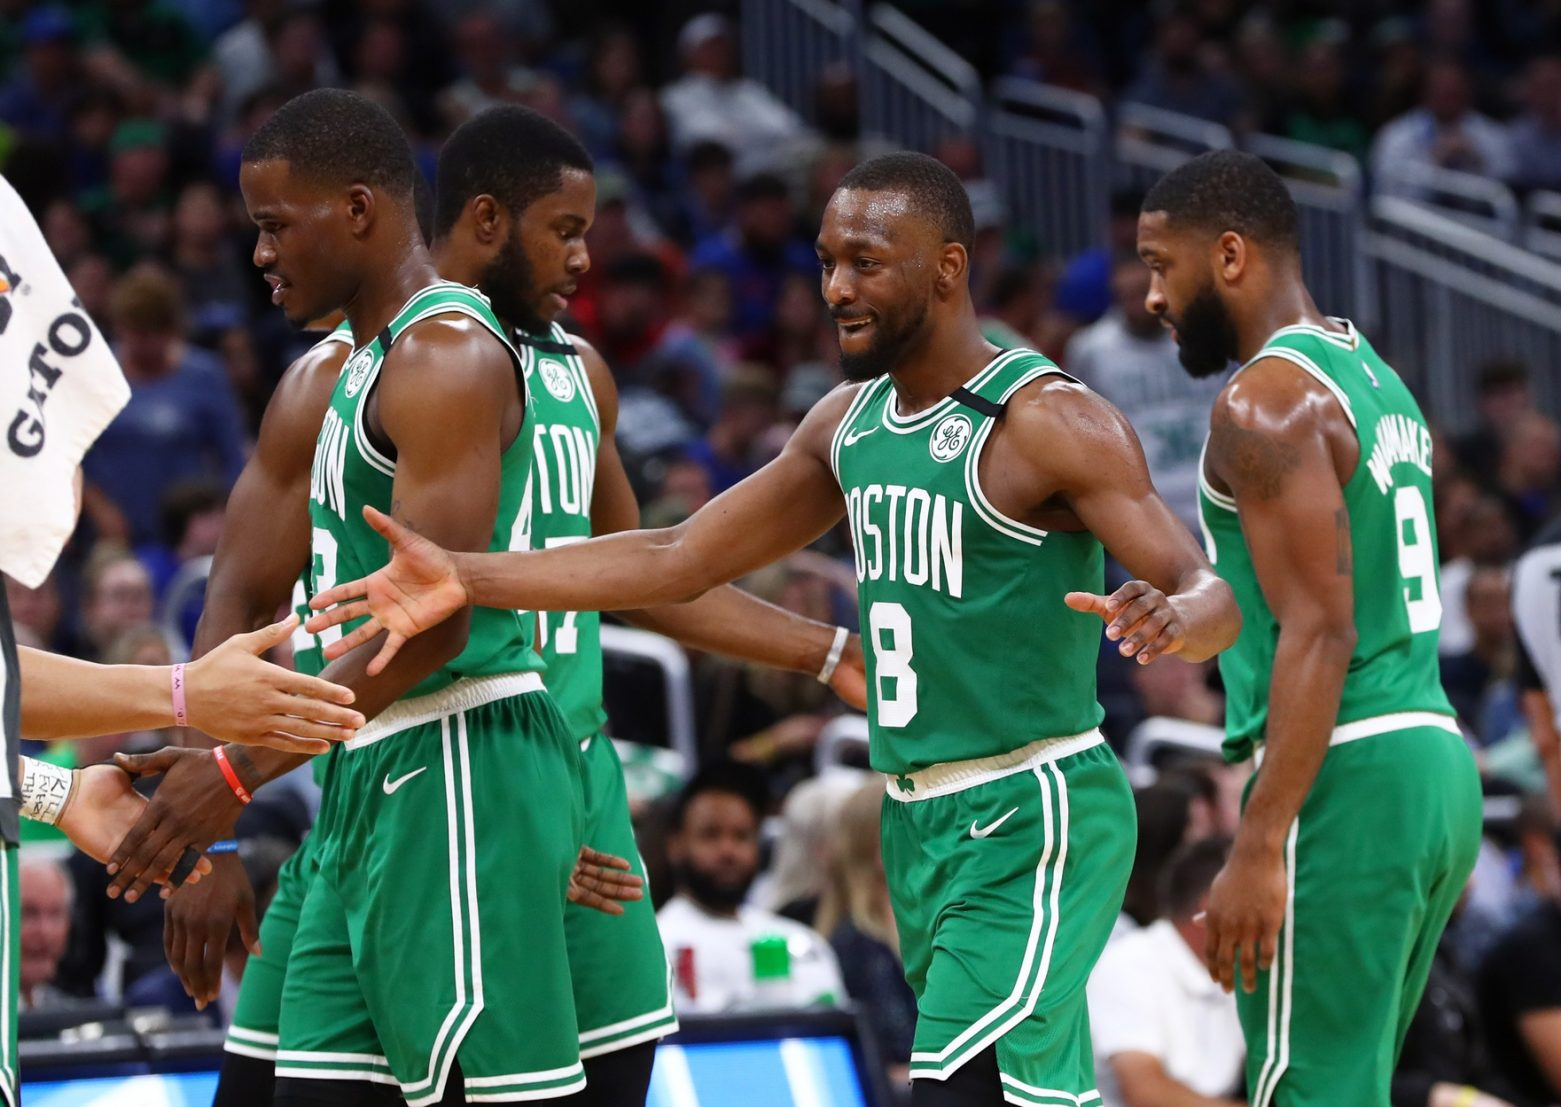 Rapid Recap: Kemba's firepower pushes Celtics through early slump to defeat Magic